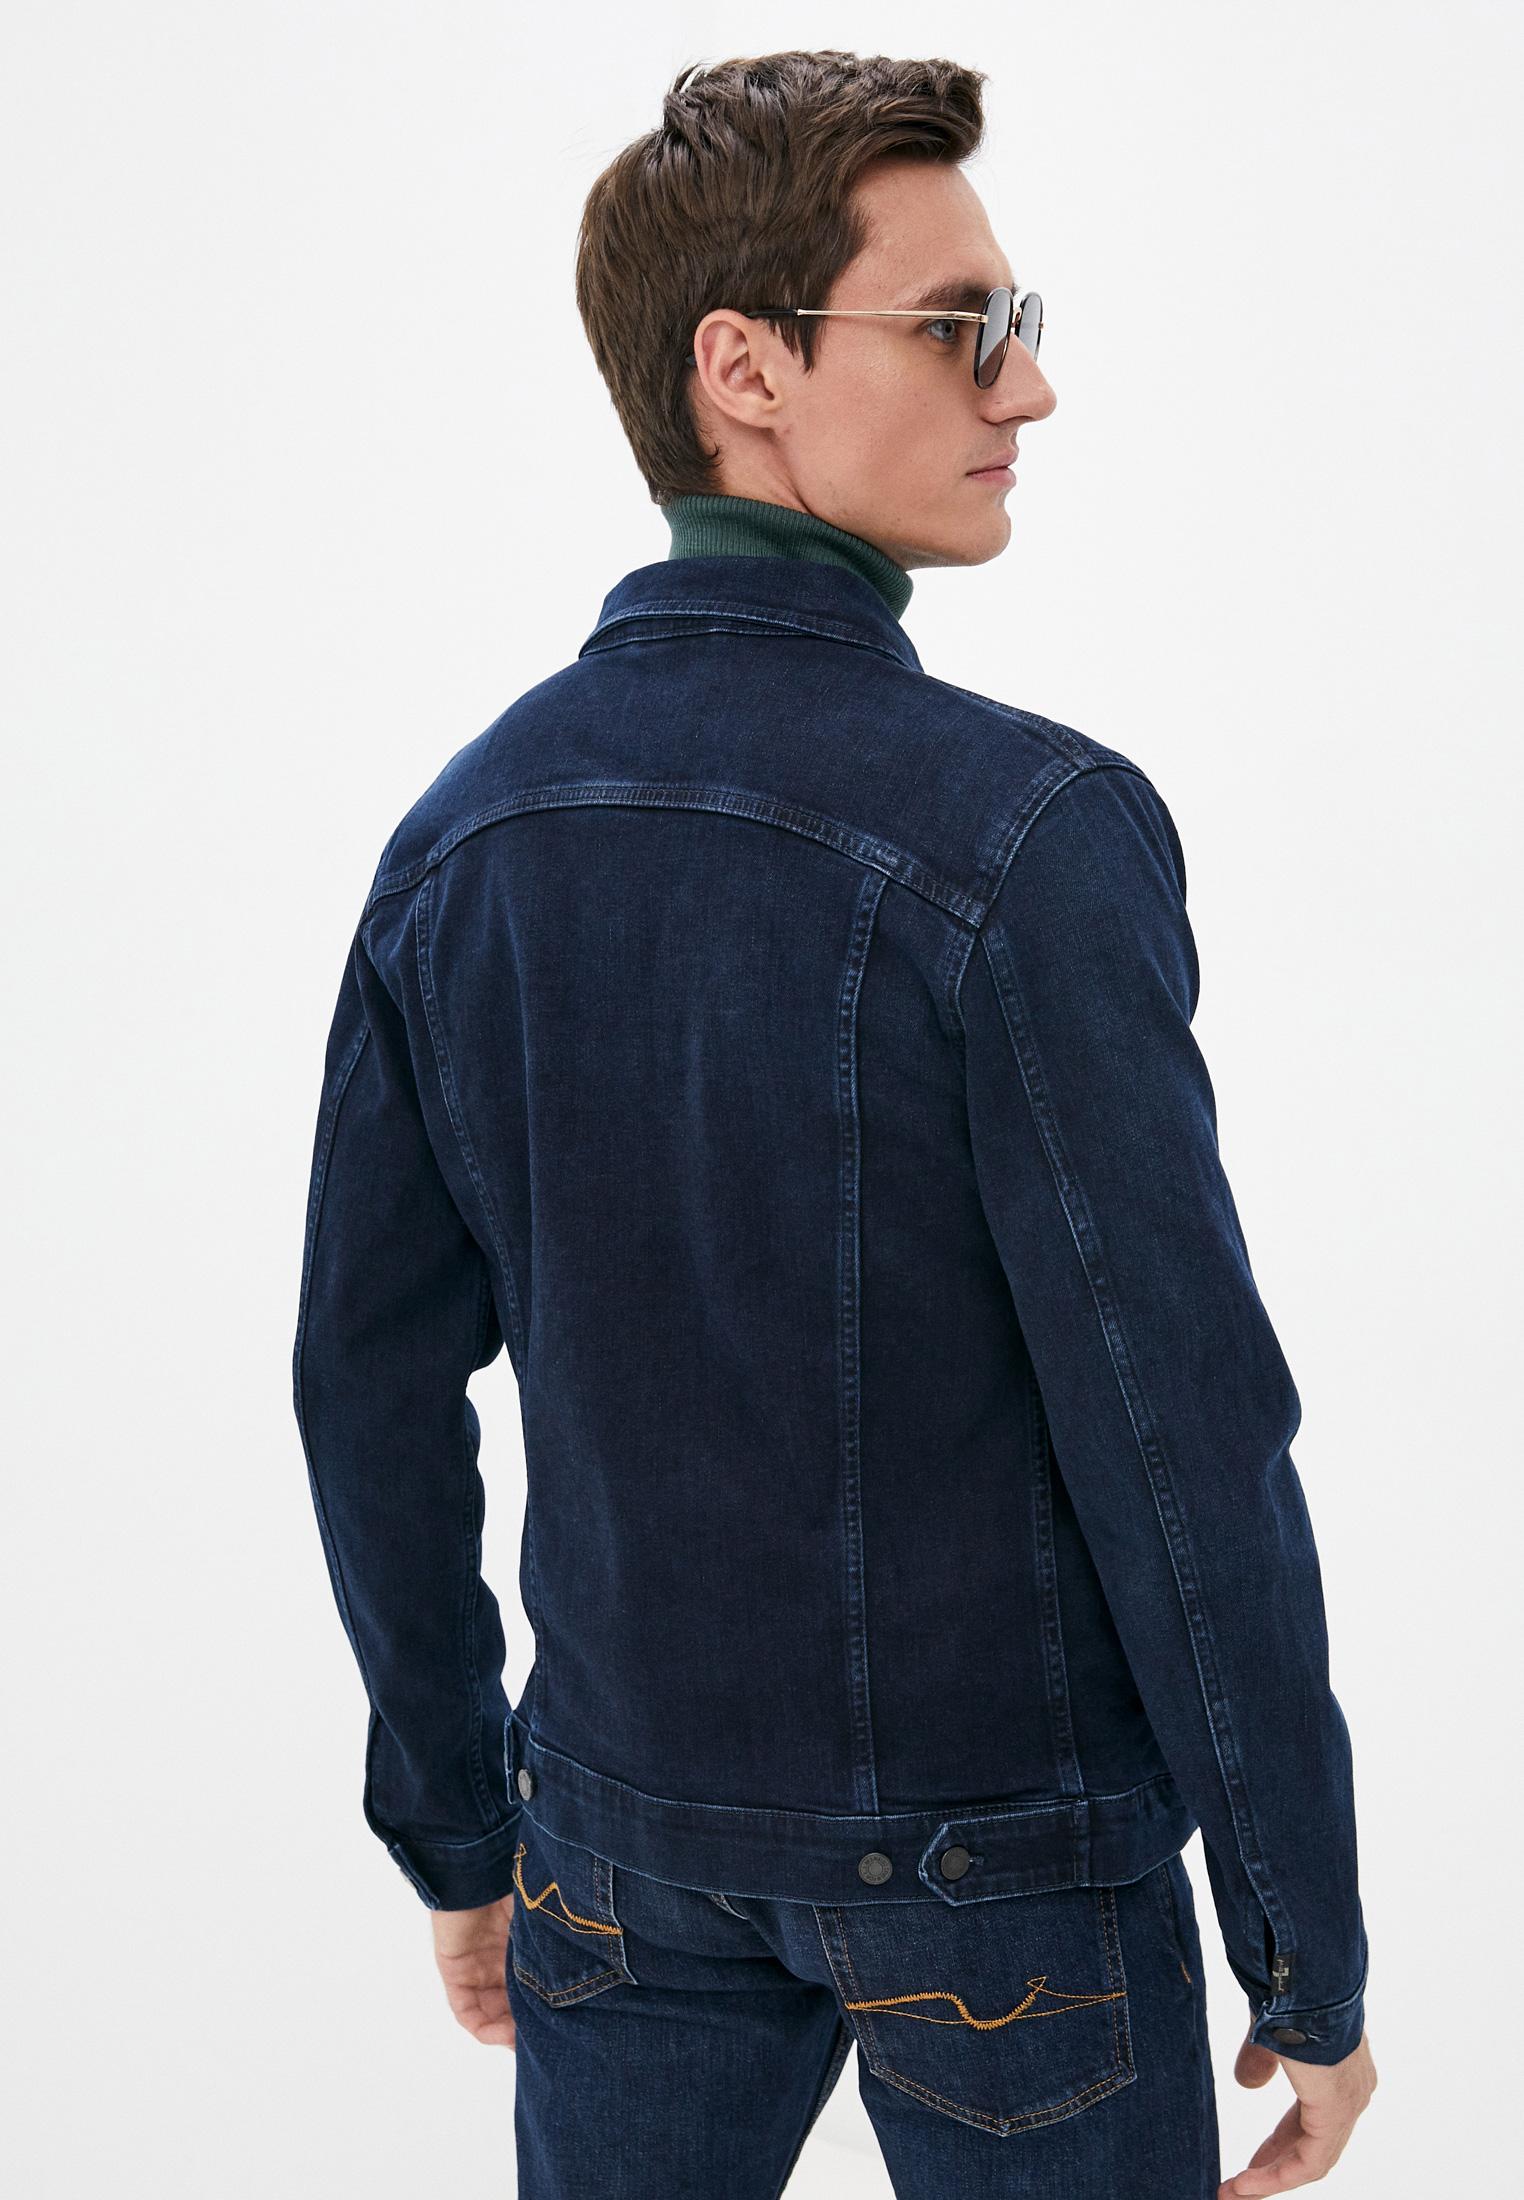 Джинсовая куртка 7 For All Mankind (7 Фо Олл Мэнкайнд) JSK5R460LL: изображение 4